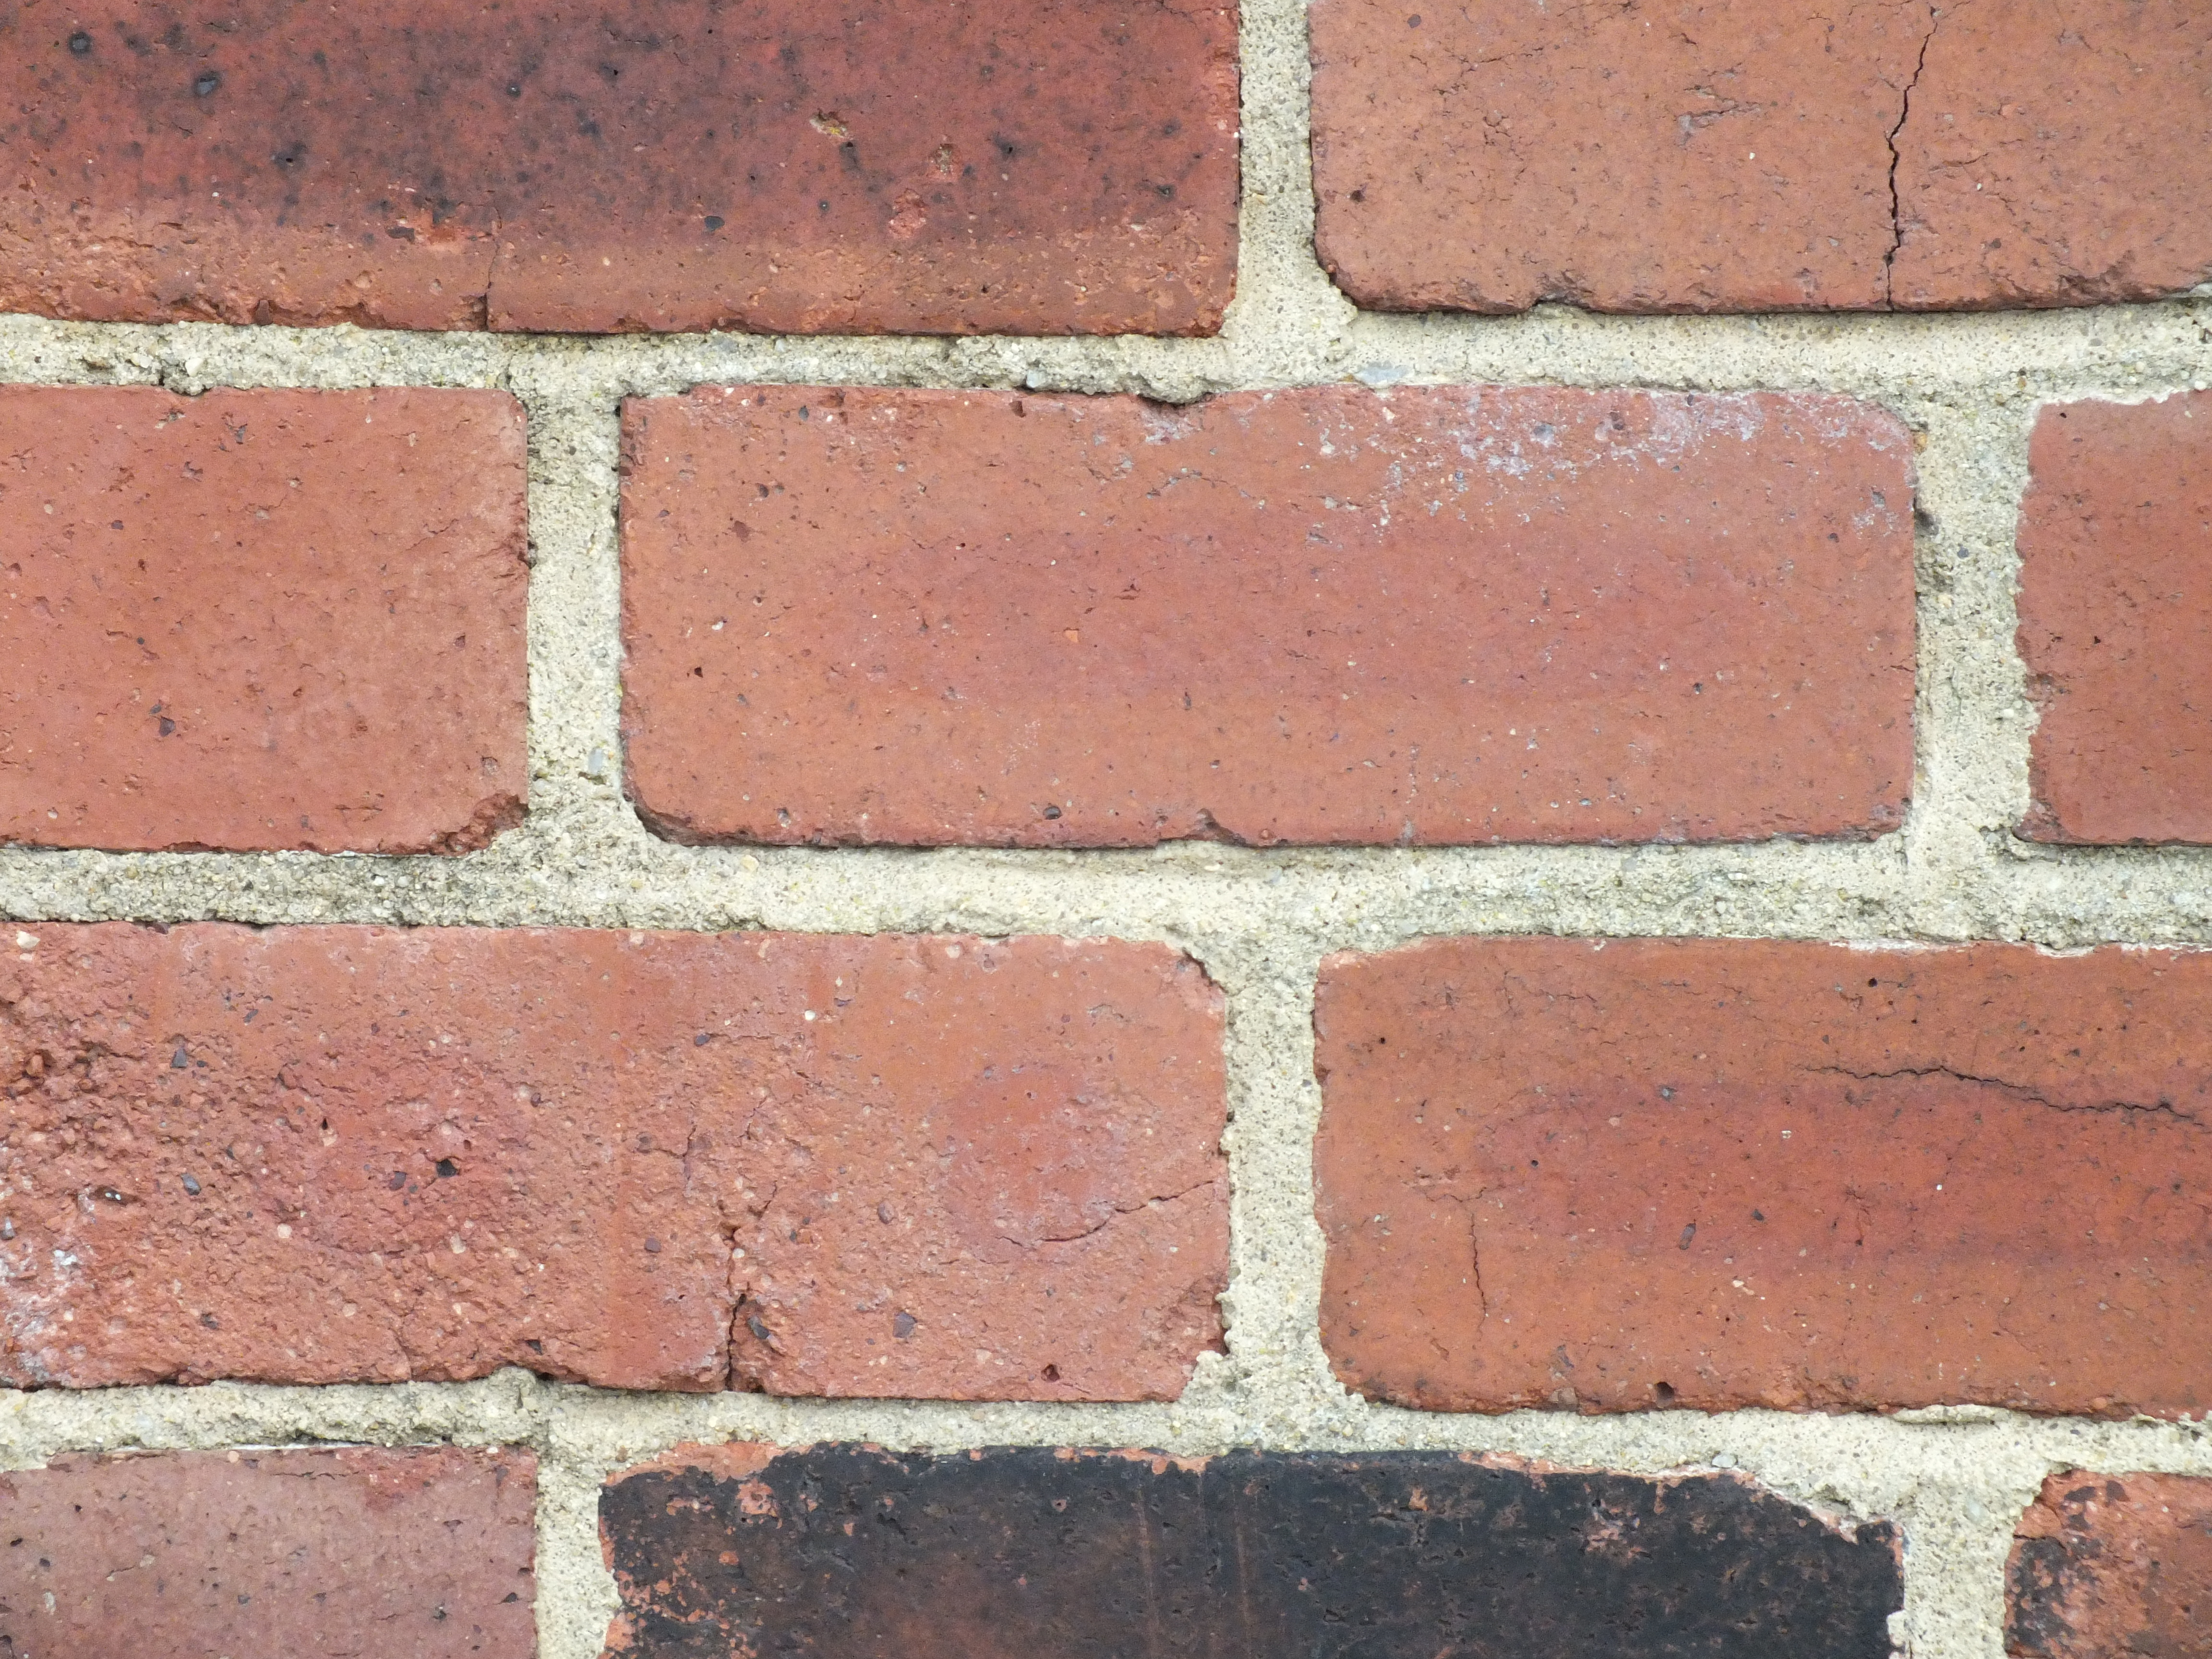 Brick Wall, Brick, Grunge, Red, Rough, HQ Photo